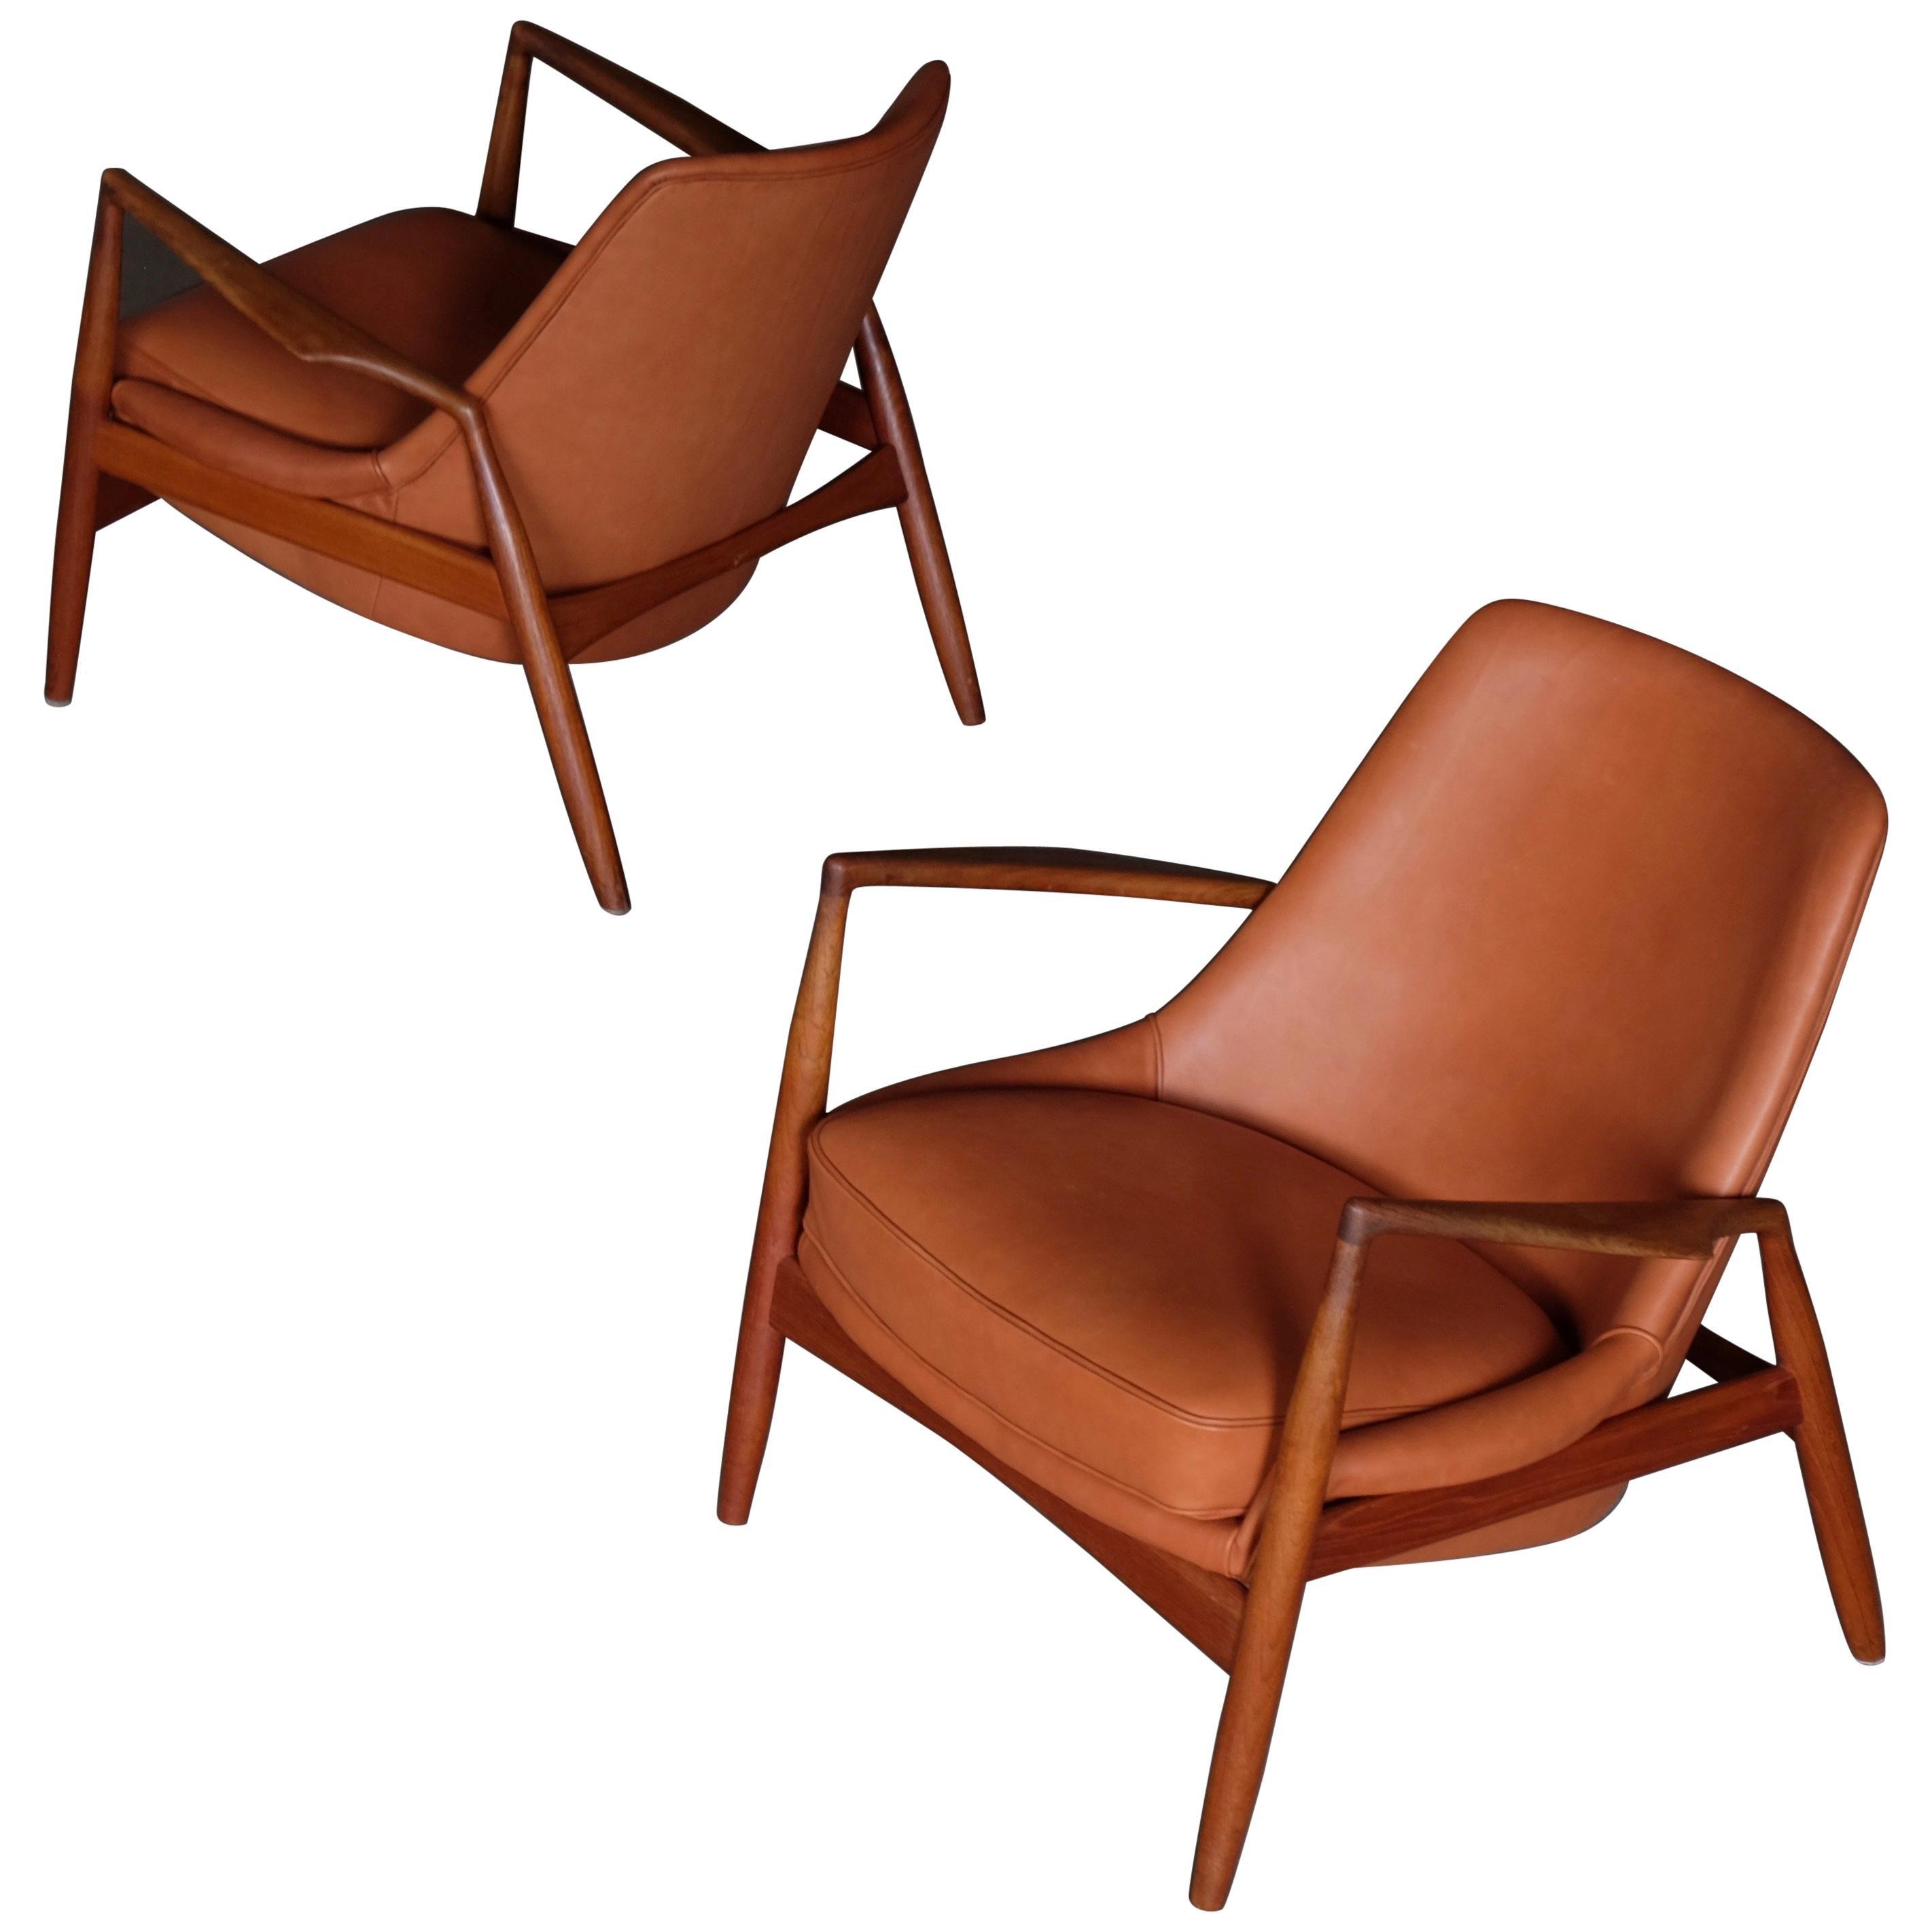 Rare Pair of Ib Kofod-Larsen Seal or Sälen Easy Chairs, 1960s